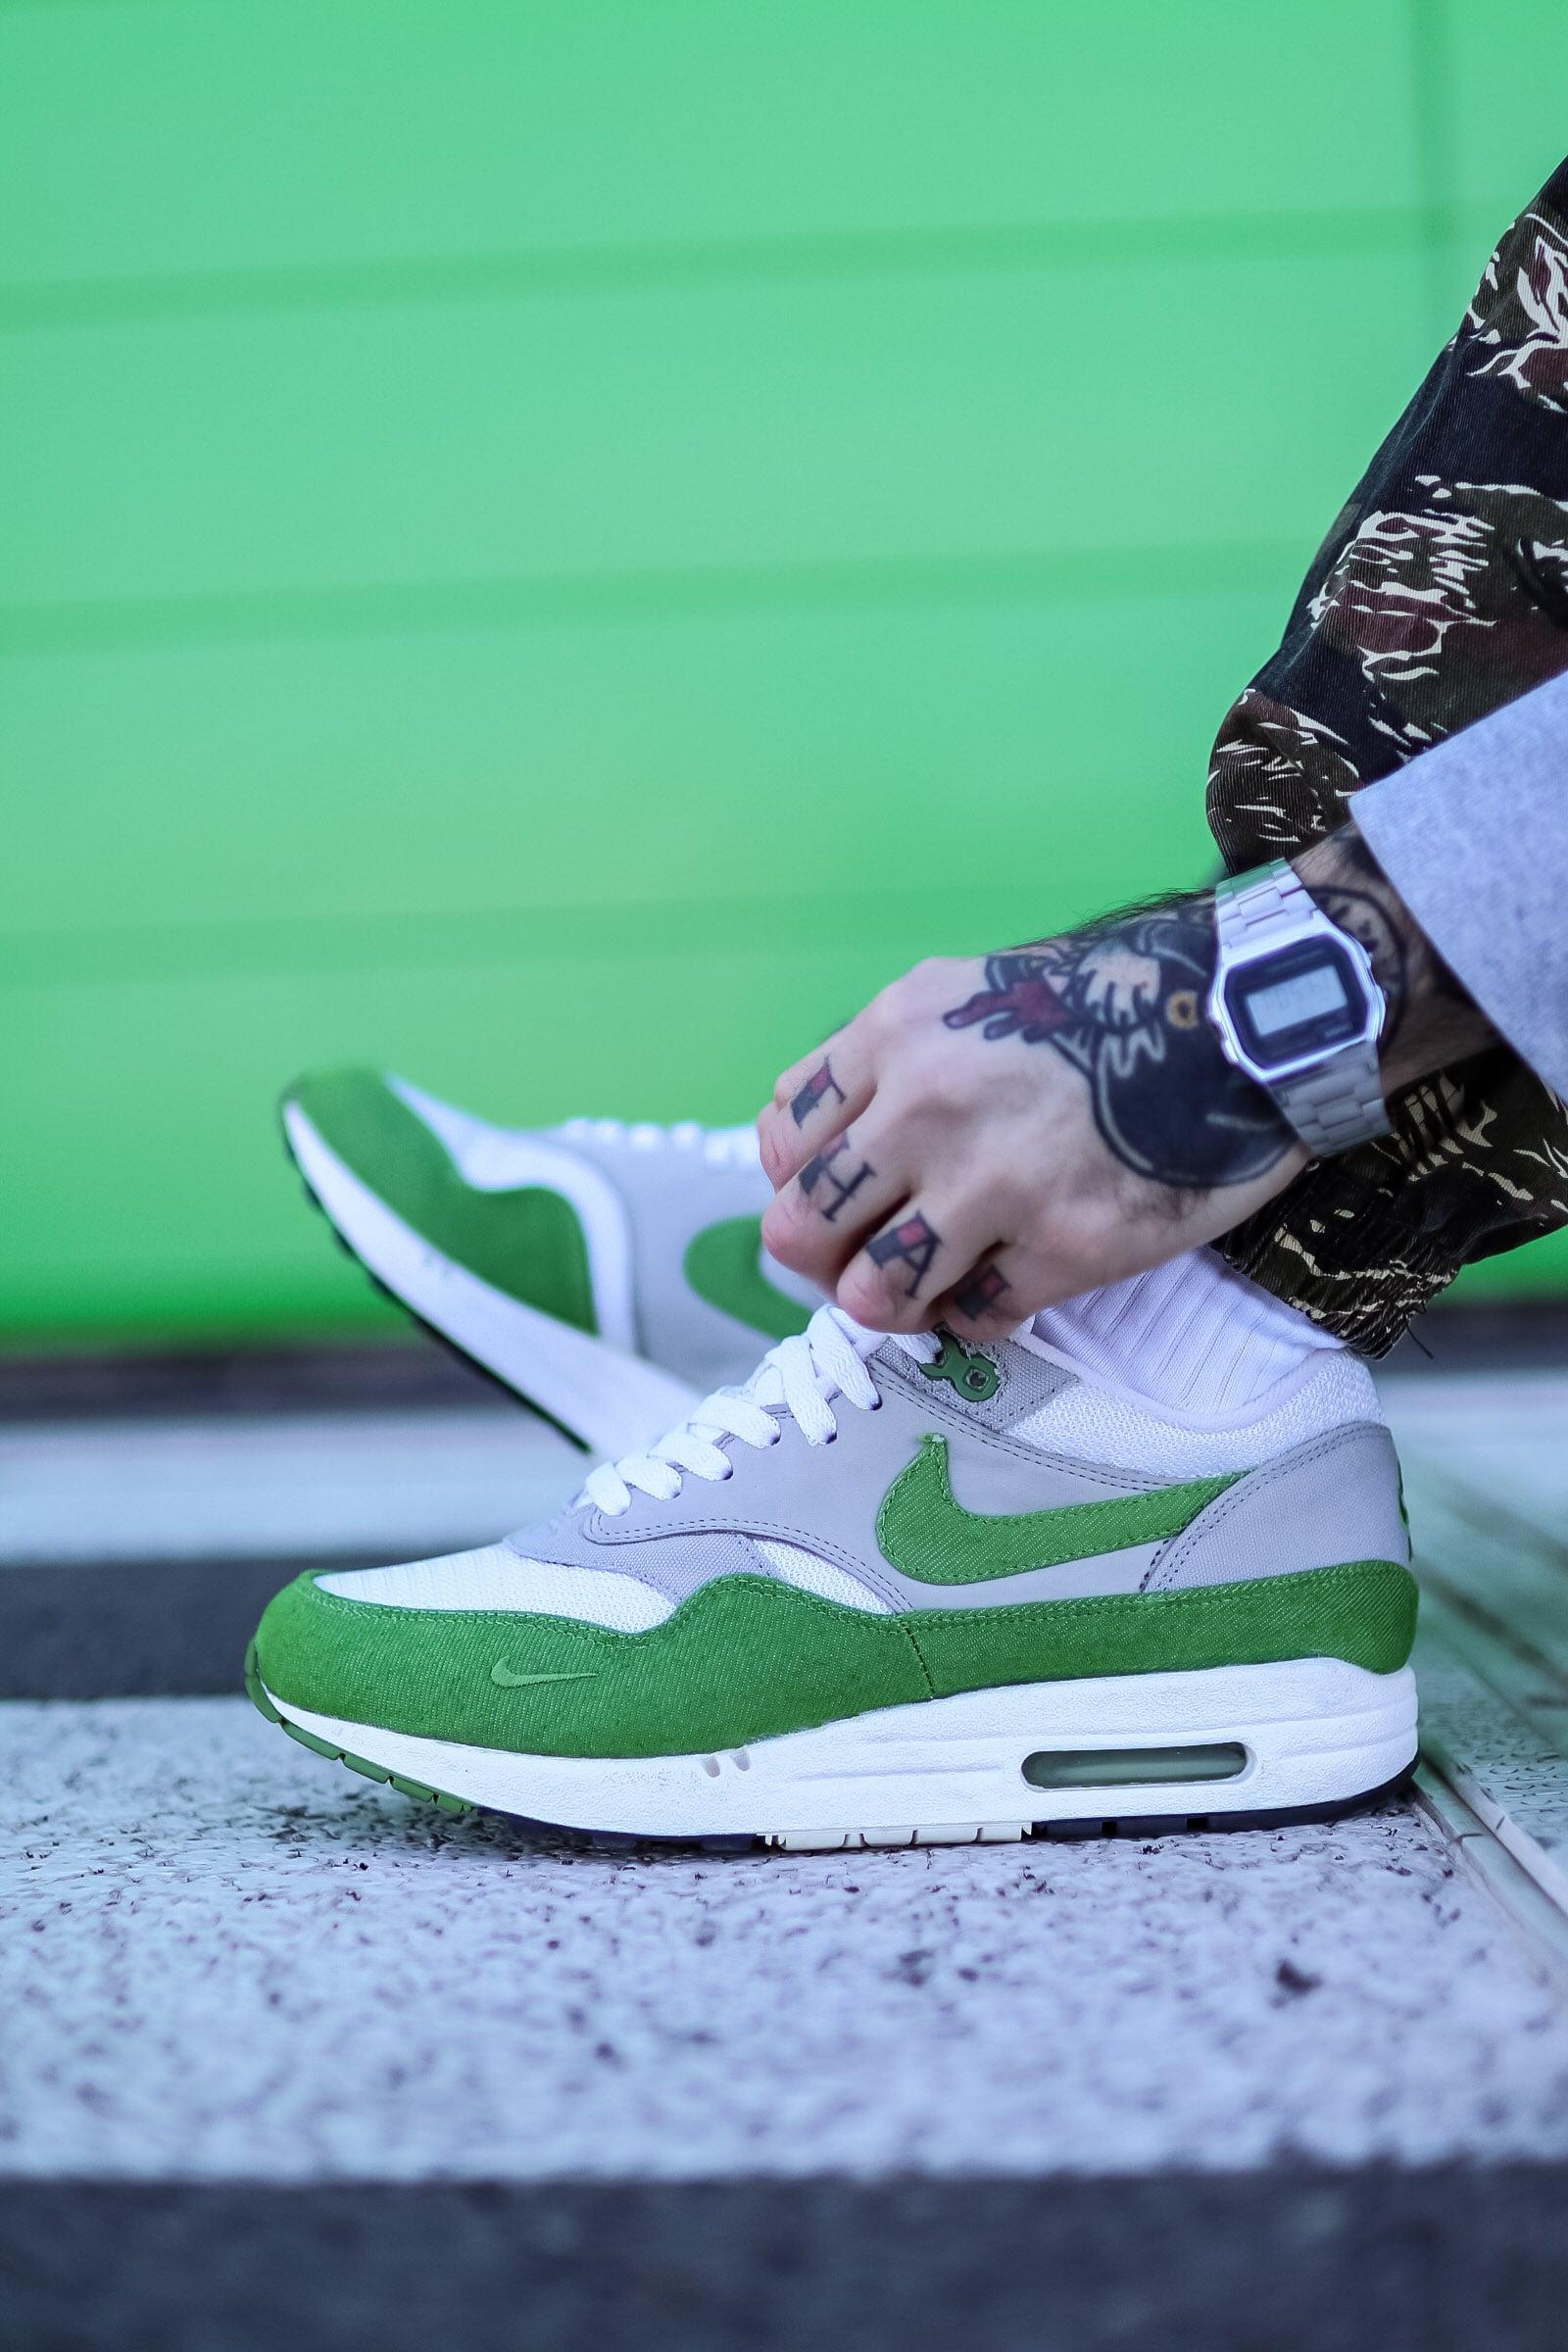 Atmos x Nike Air Max 1 Chlorophyll